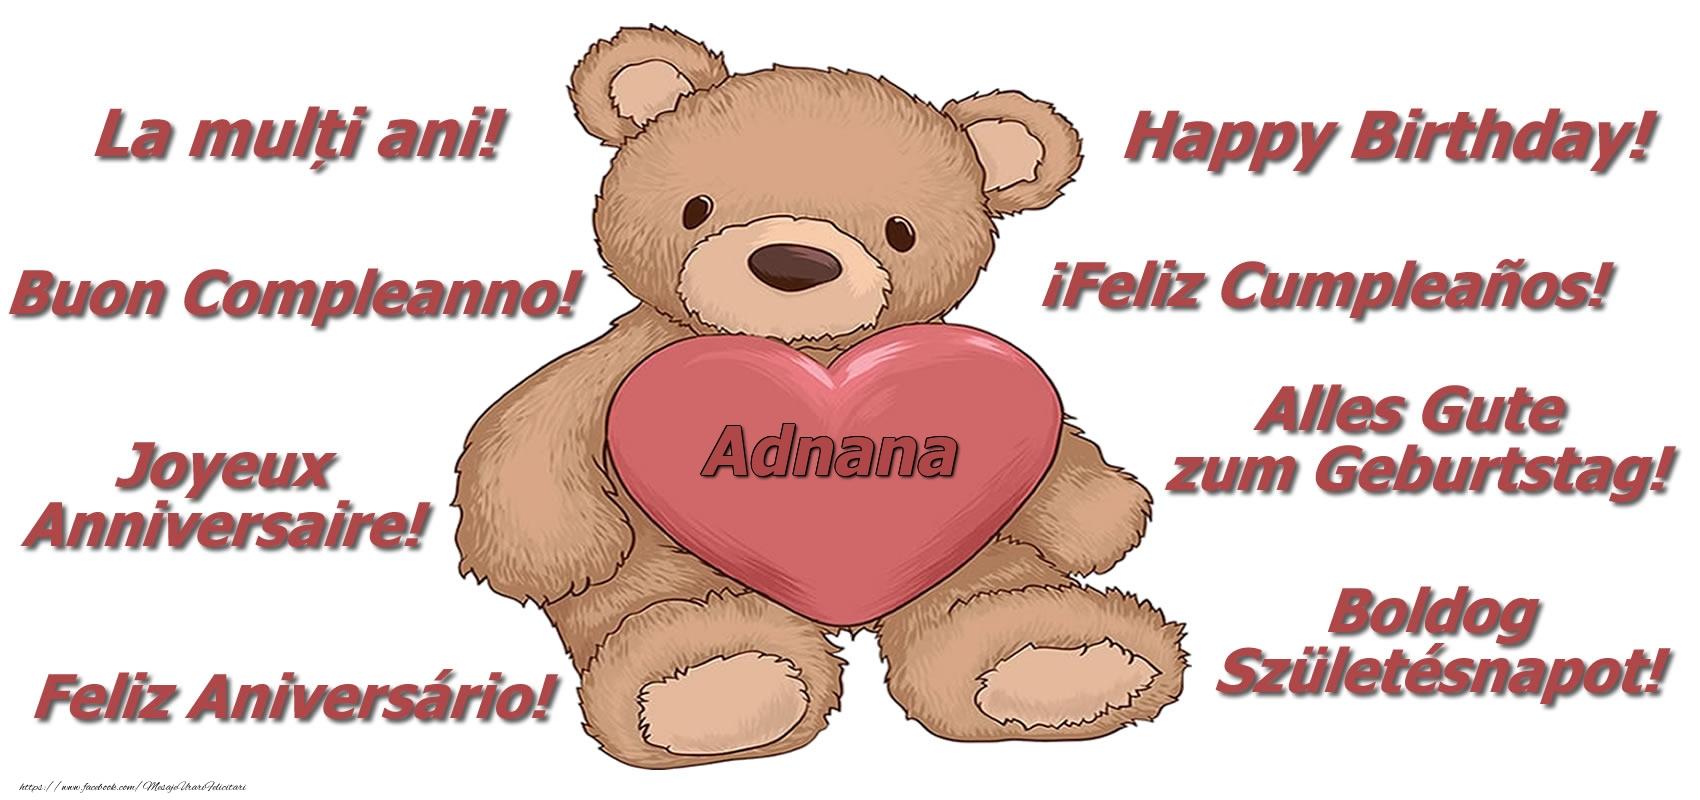 Felicitari de zi de nastere - La multi ani Adnana! - Ursulet